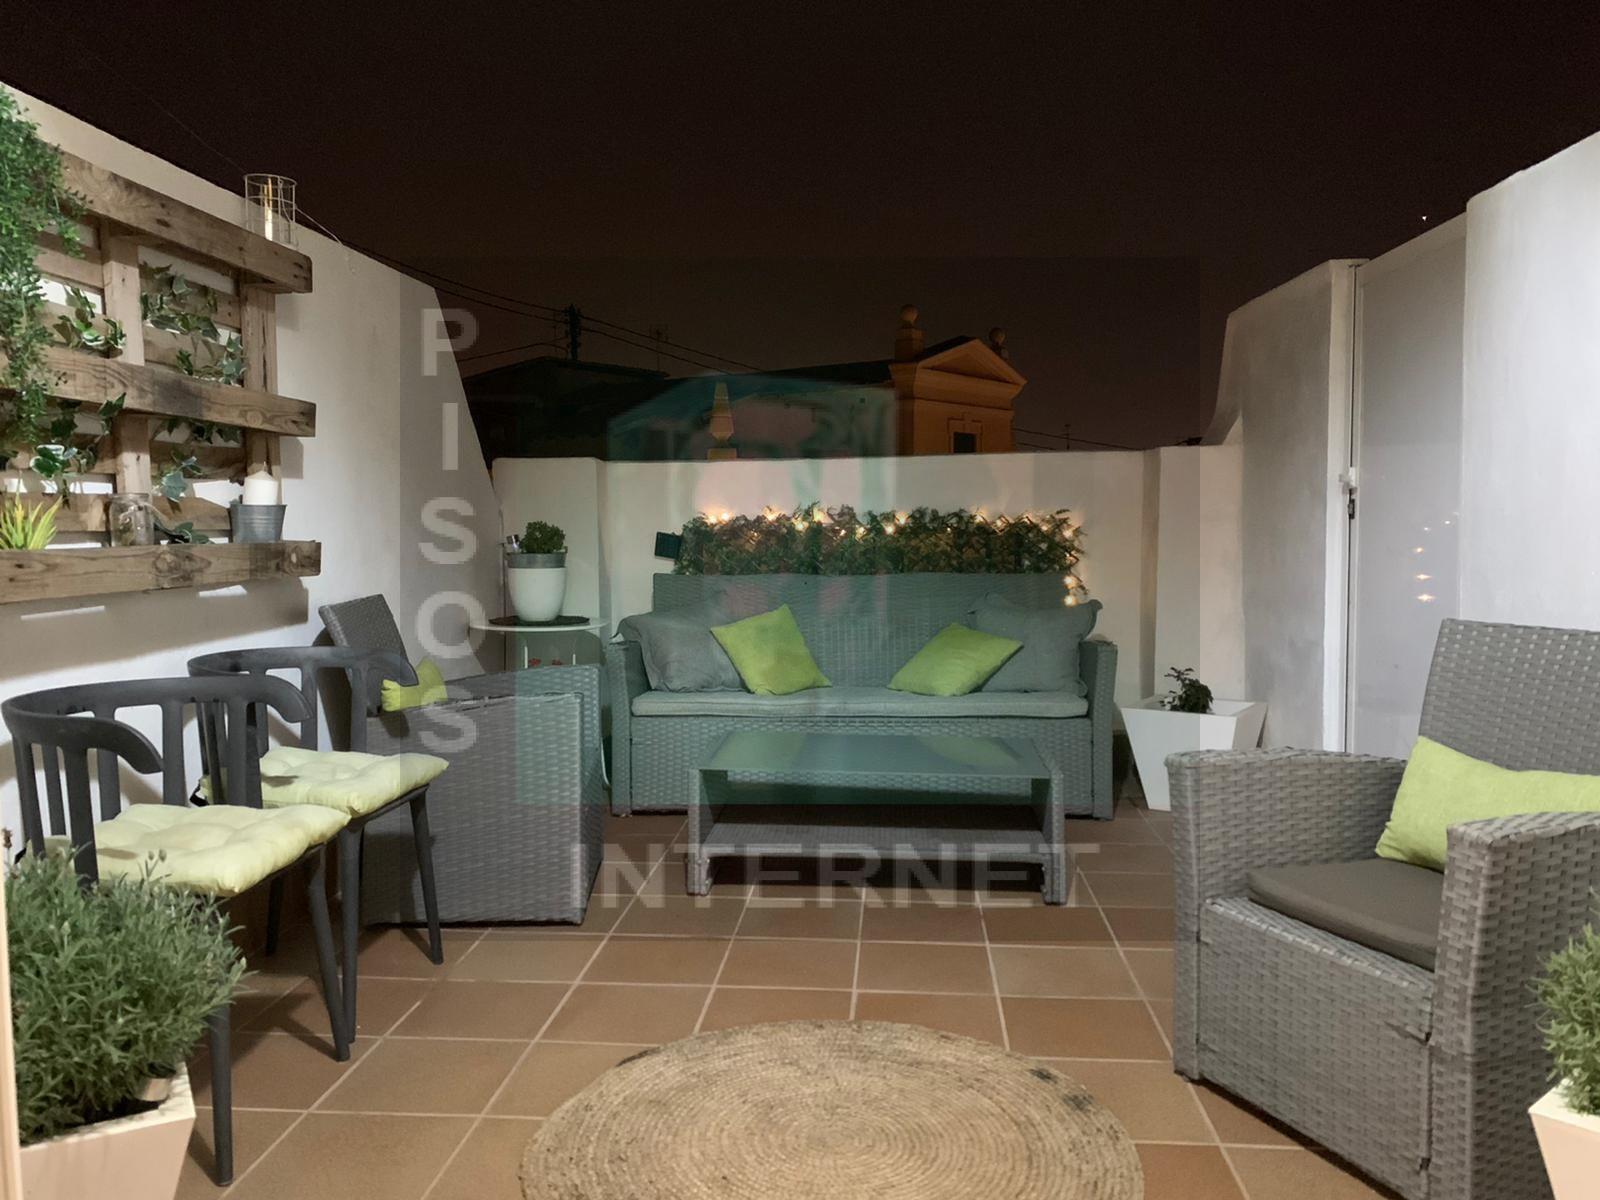 Alquiler Atico con muebles